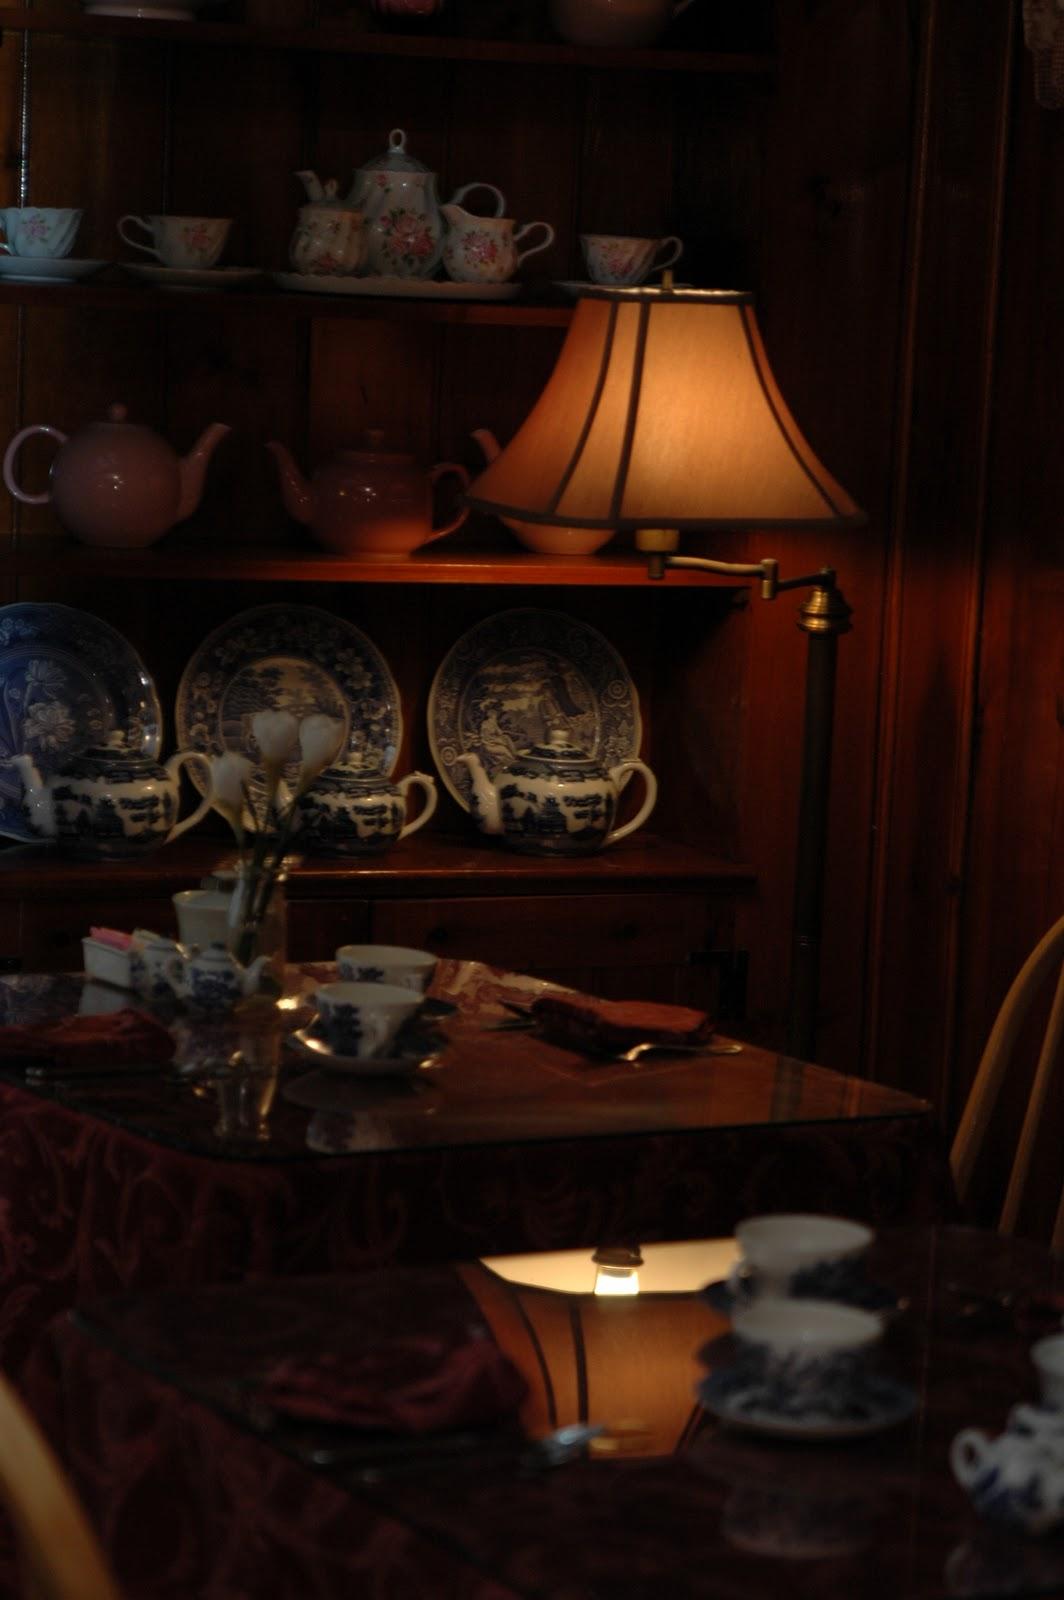 Deborah Jean S Dandelion House And Garden The Dunbar Tea